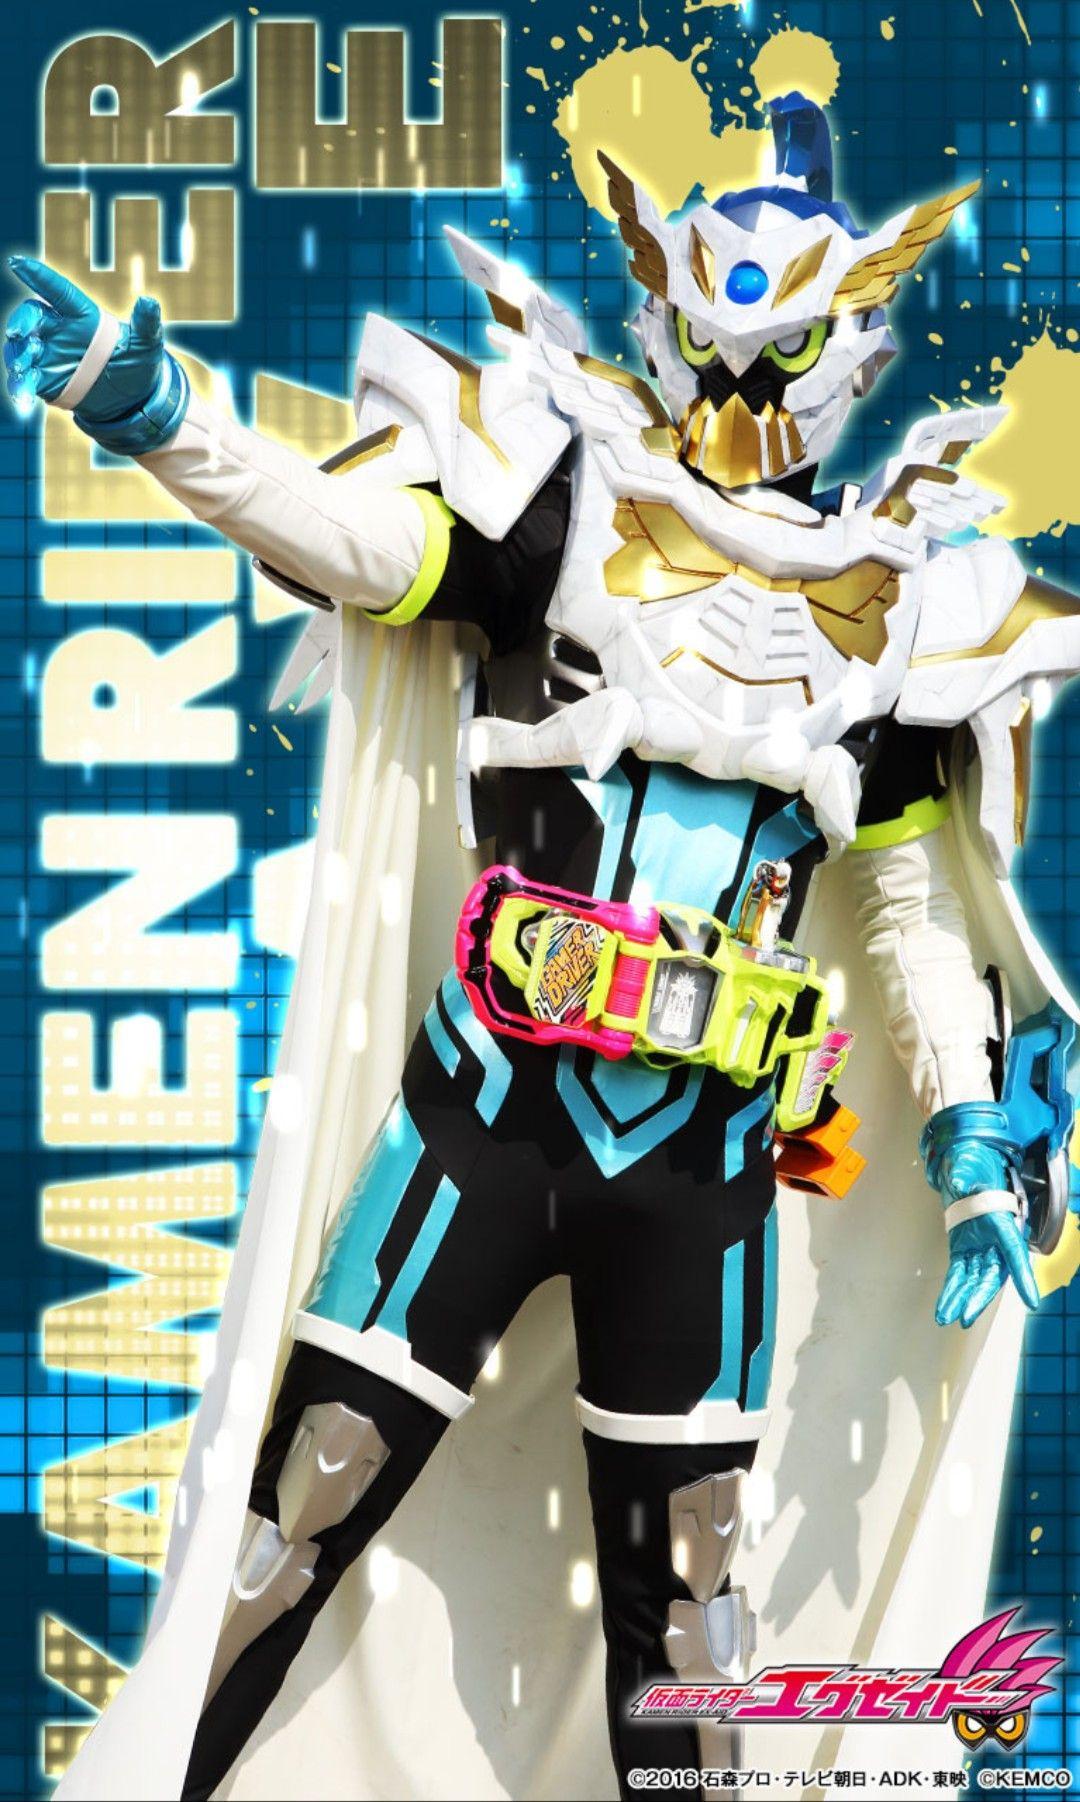 Kamen Rider Brave Legacy Gamer Lv 100 Taddle Legacy Kemco Official Pahlawan Super Animasi Hiburan